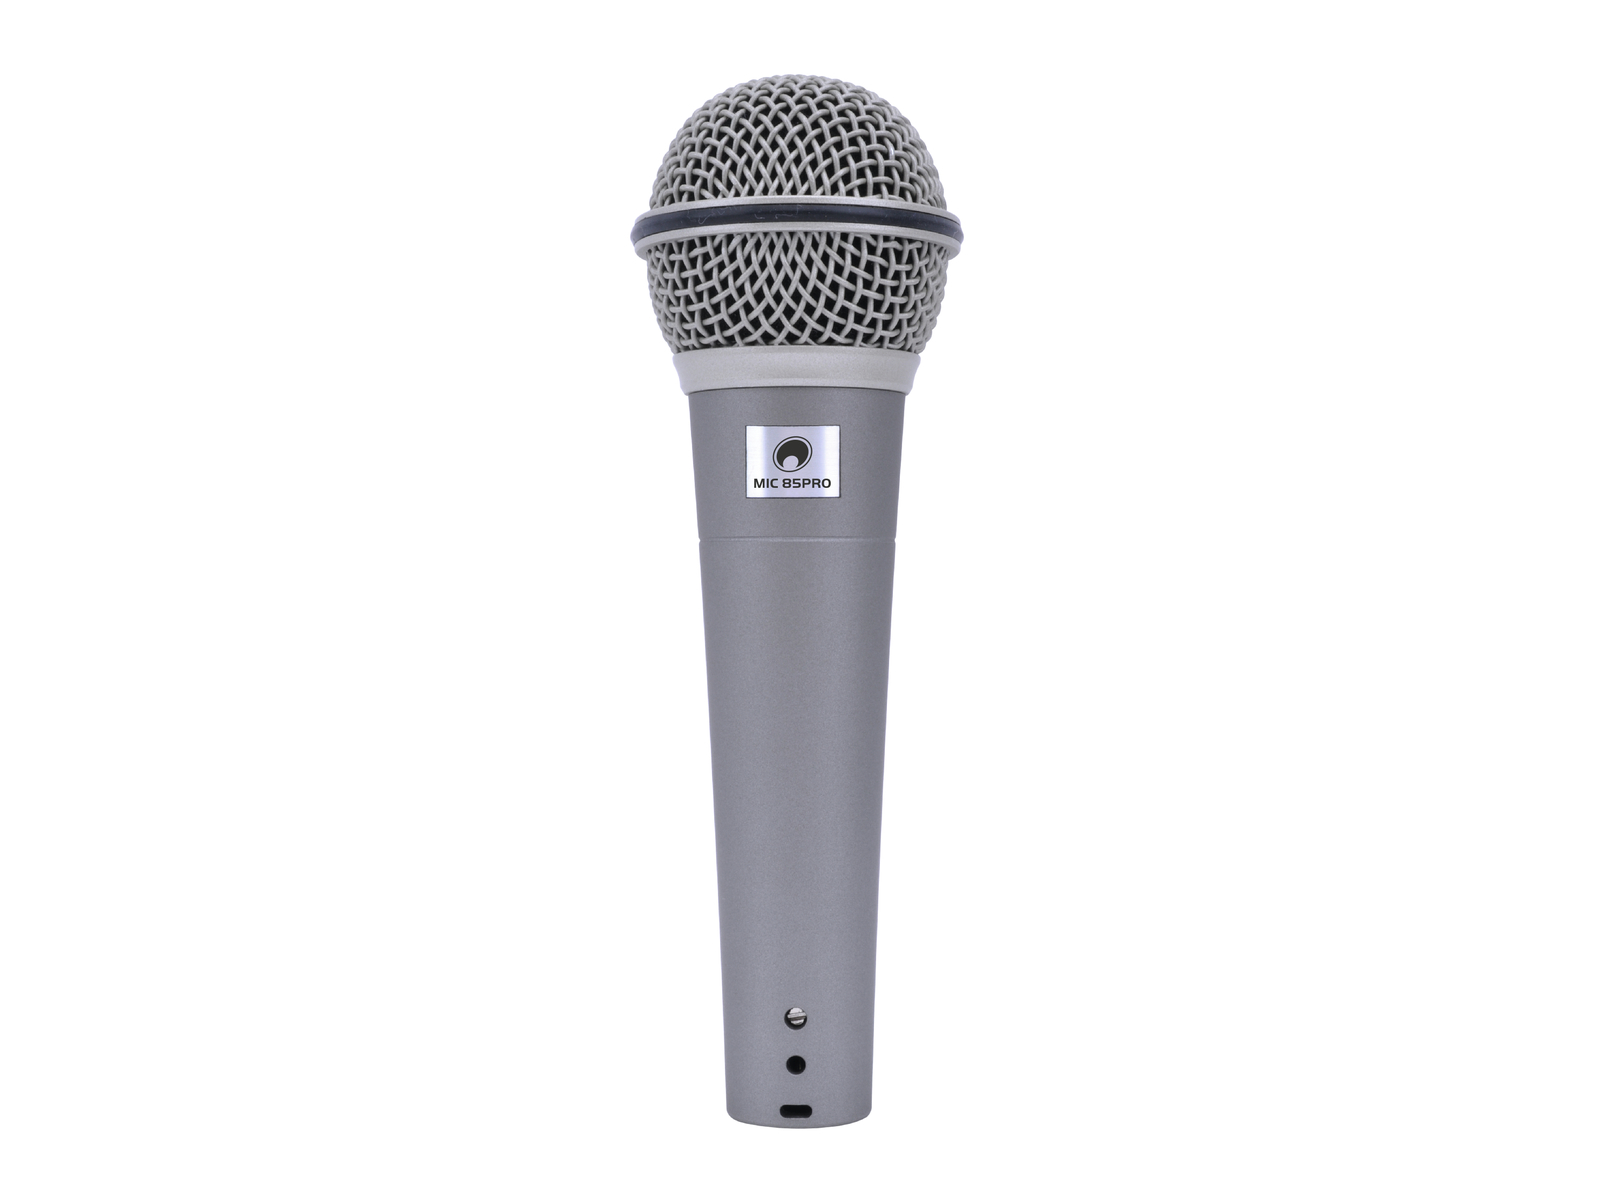 OMNITRONIC MIC 85PRO Dynamisches Mikrofon